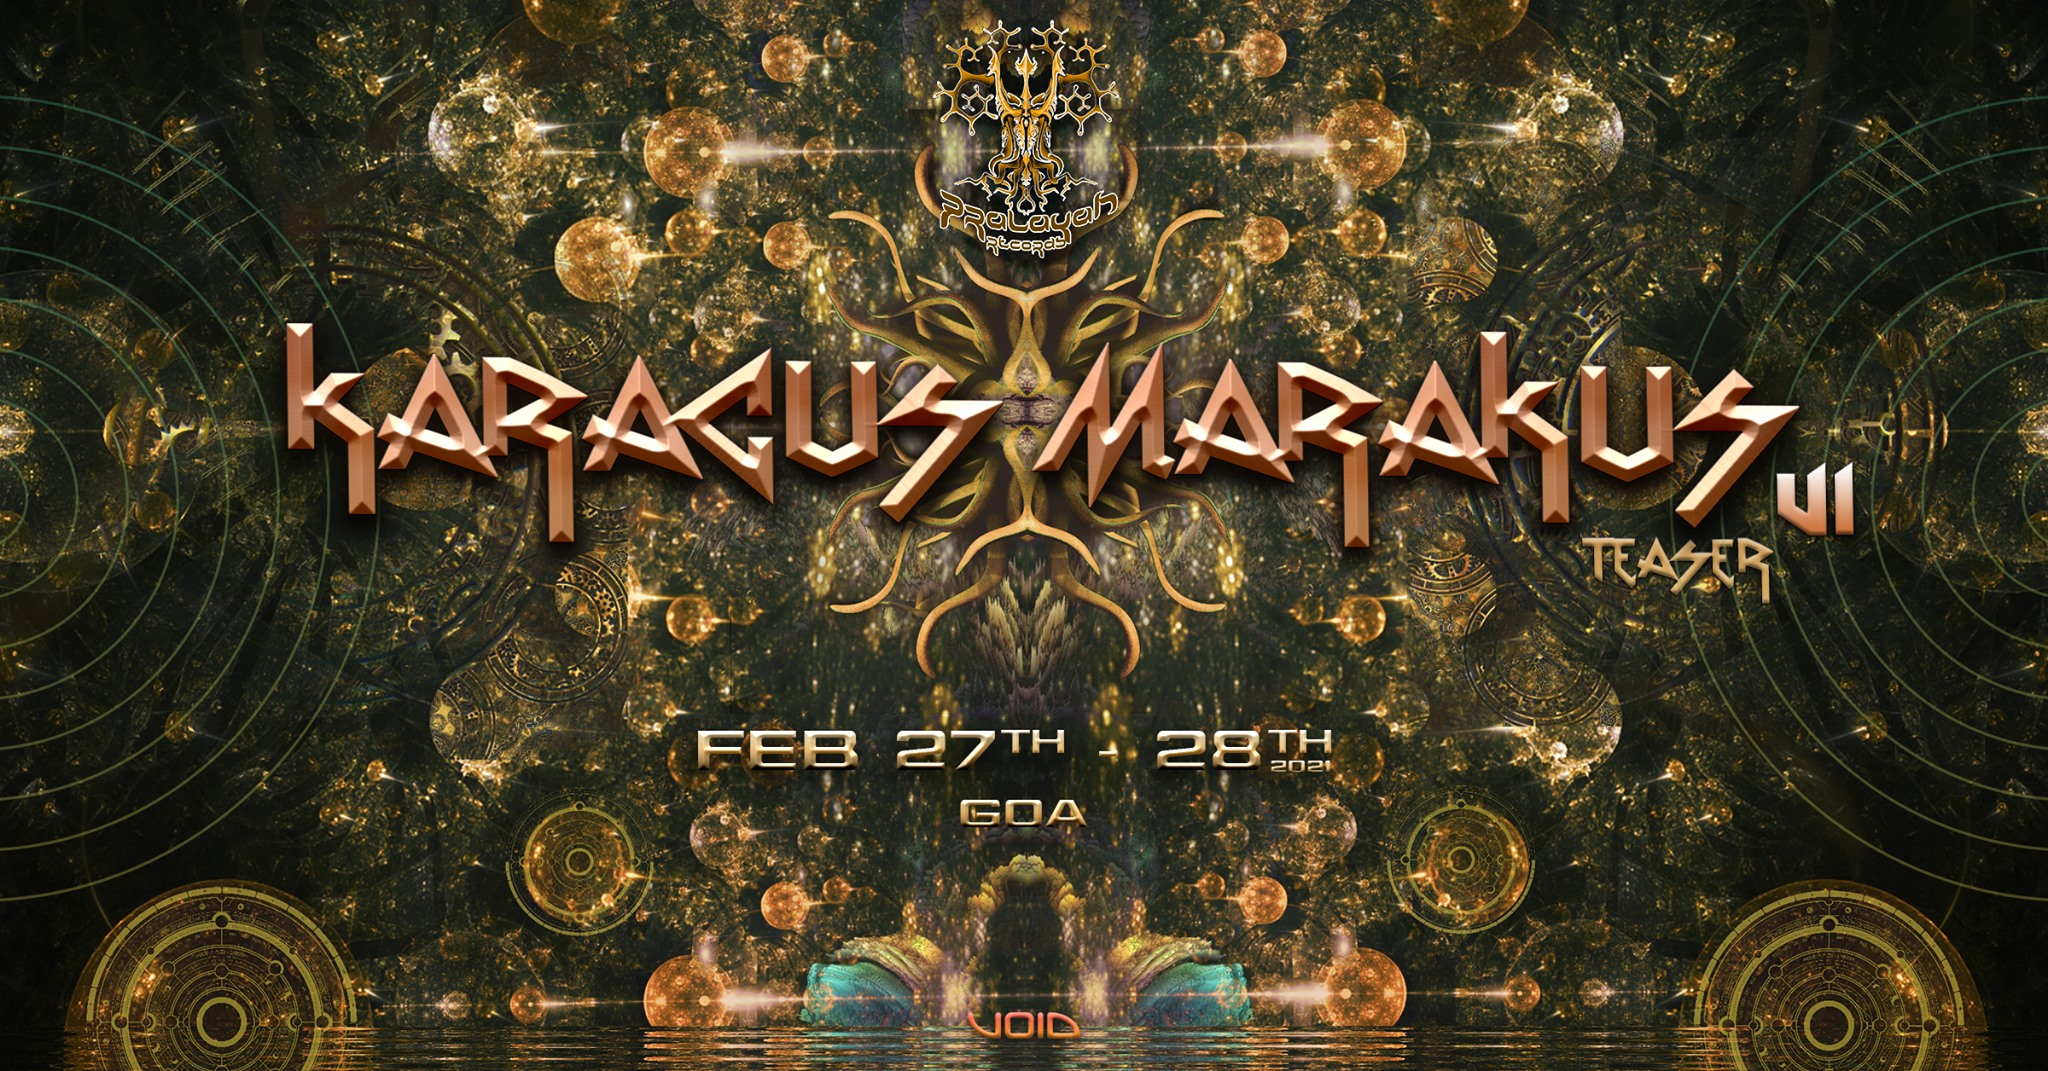 Karacus Marakus Festival (VI) Teaser 27th Feb, Goa